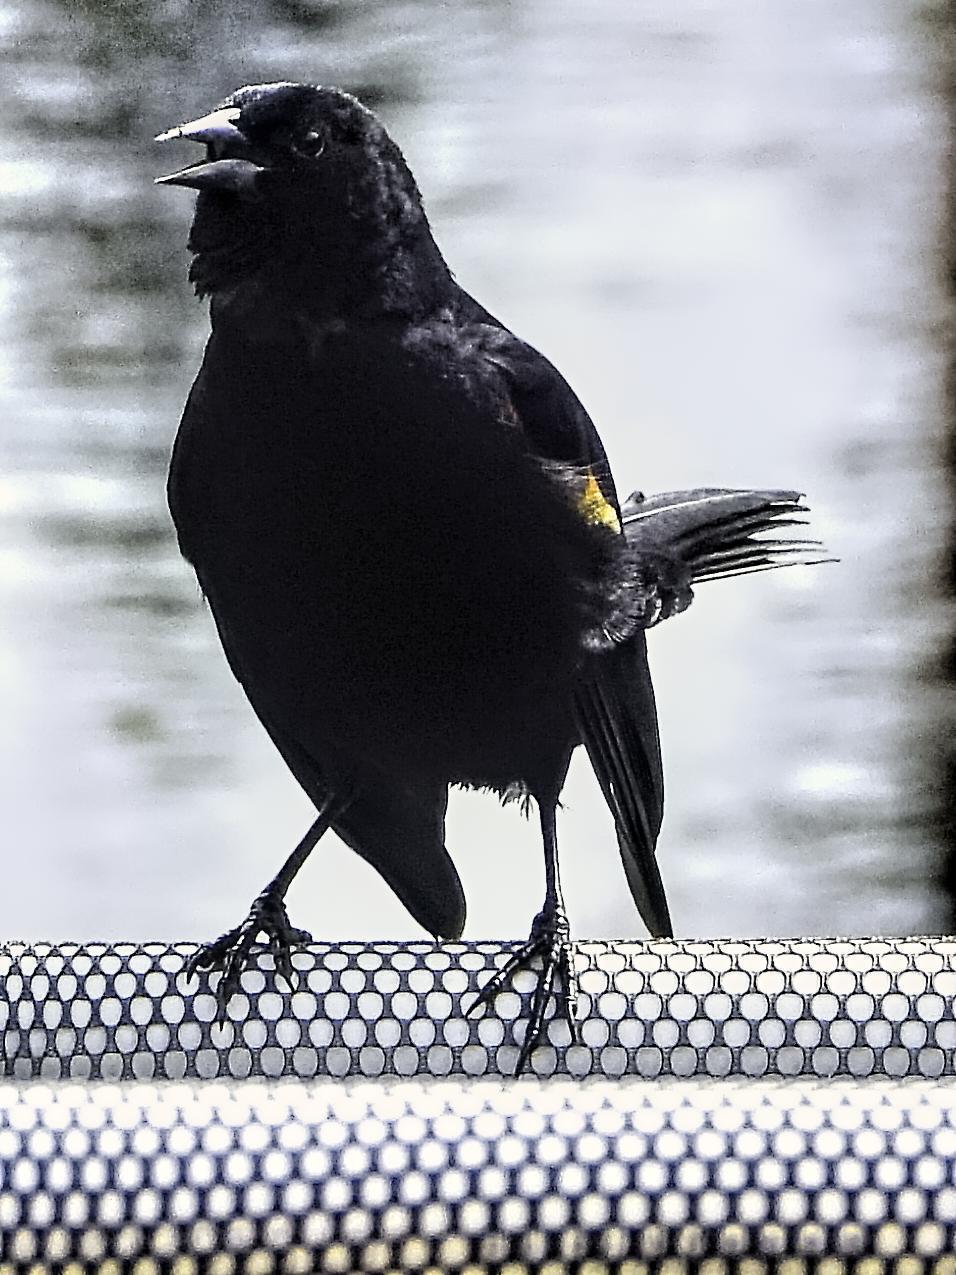 Red-winged Blackbird Photo by Dan Tallman